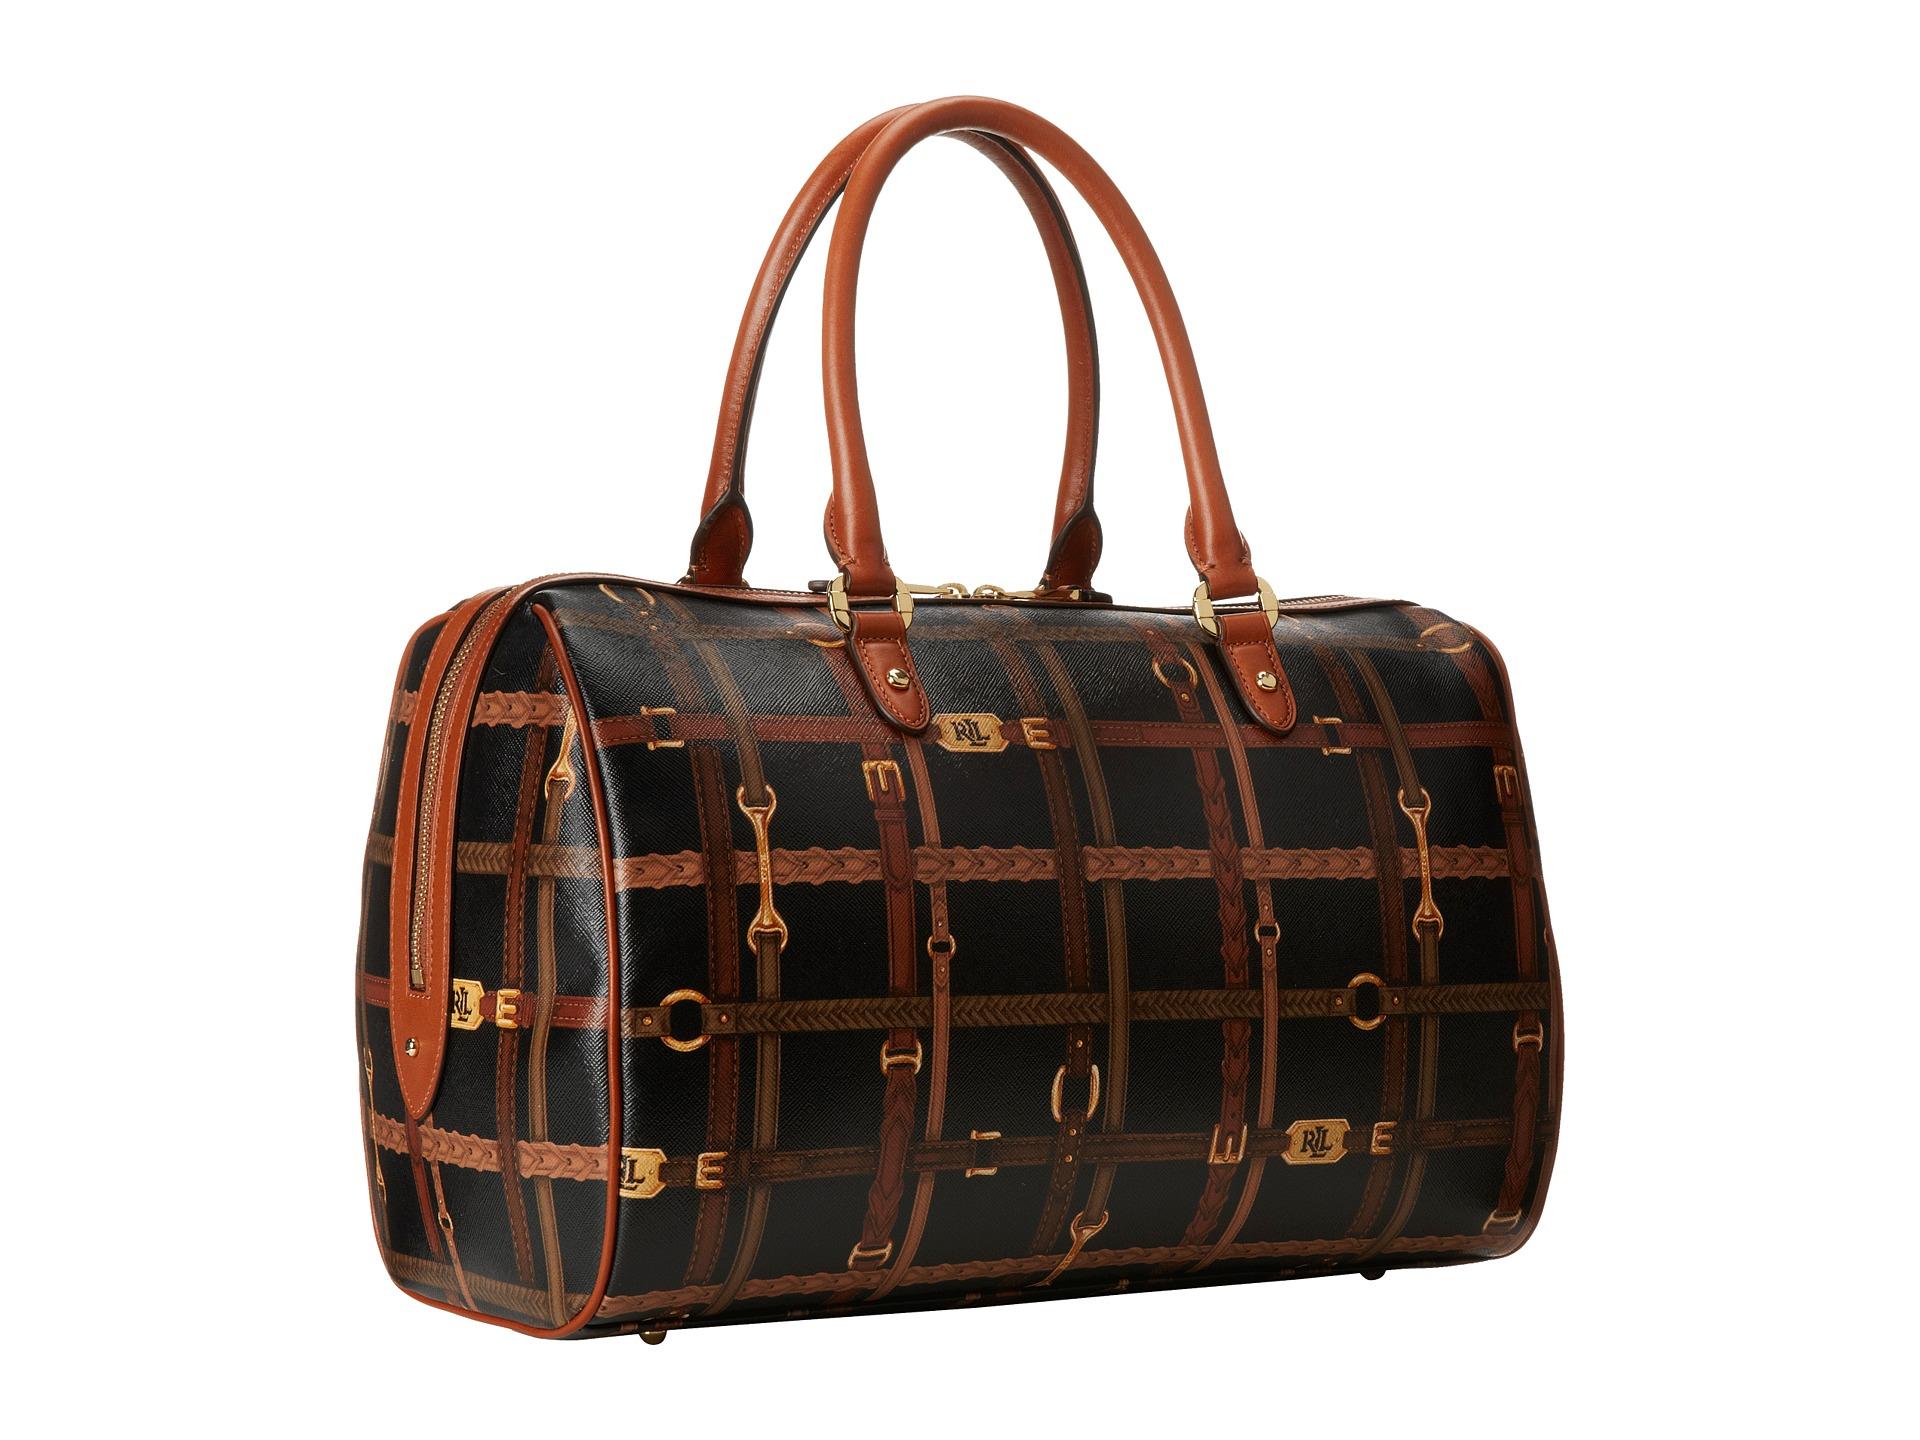 Shop Dillard's for your favorites Lauren Ralph Lauren handbags from Brahmin, Coach, MICHAEL Michael Kors, Dooney & Bourke, and Fossil. Designer purses including satchels, crossbody bags, clutches and wallets at Dillard's.